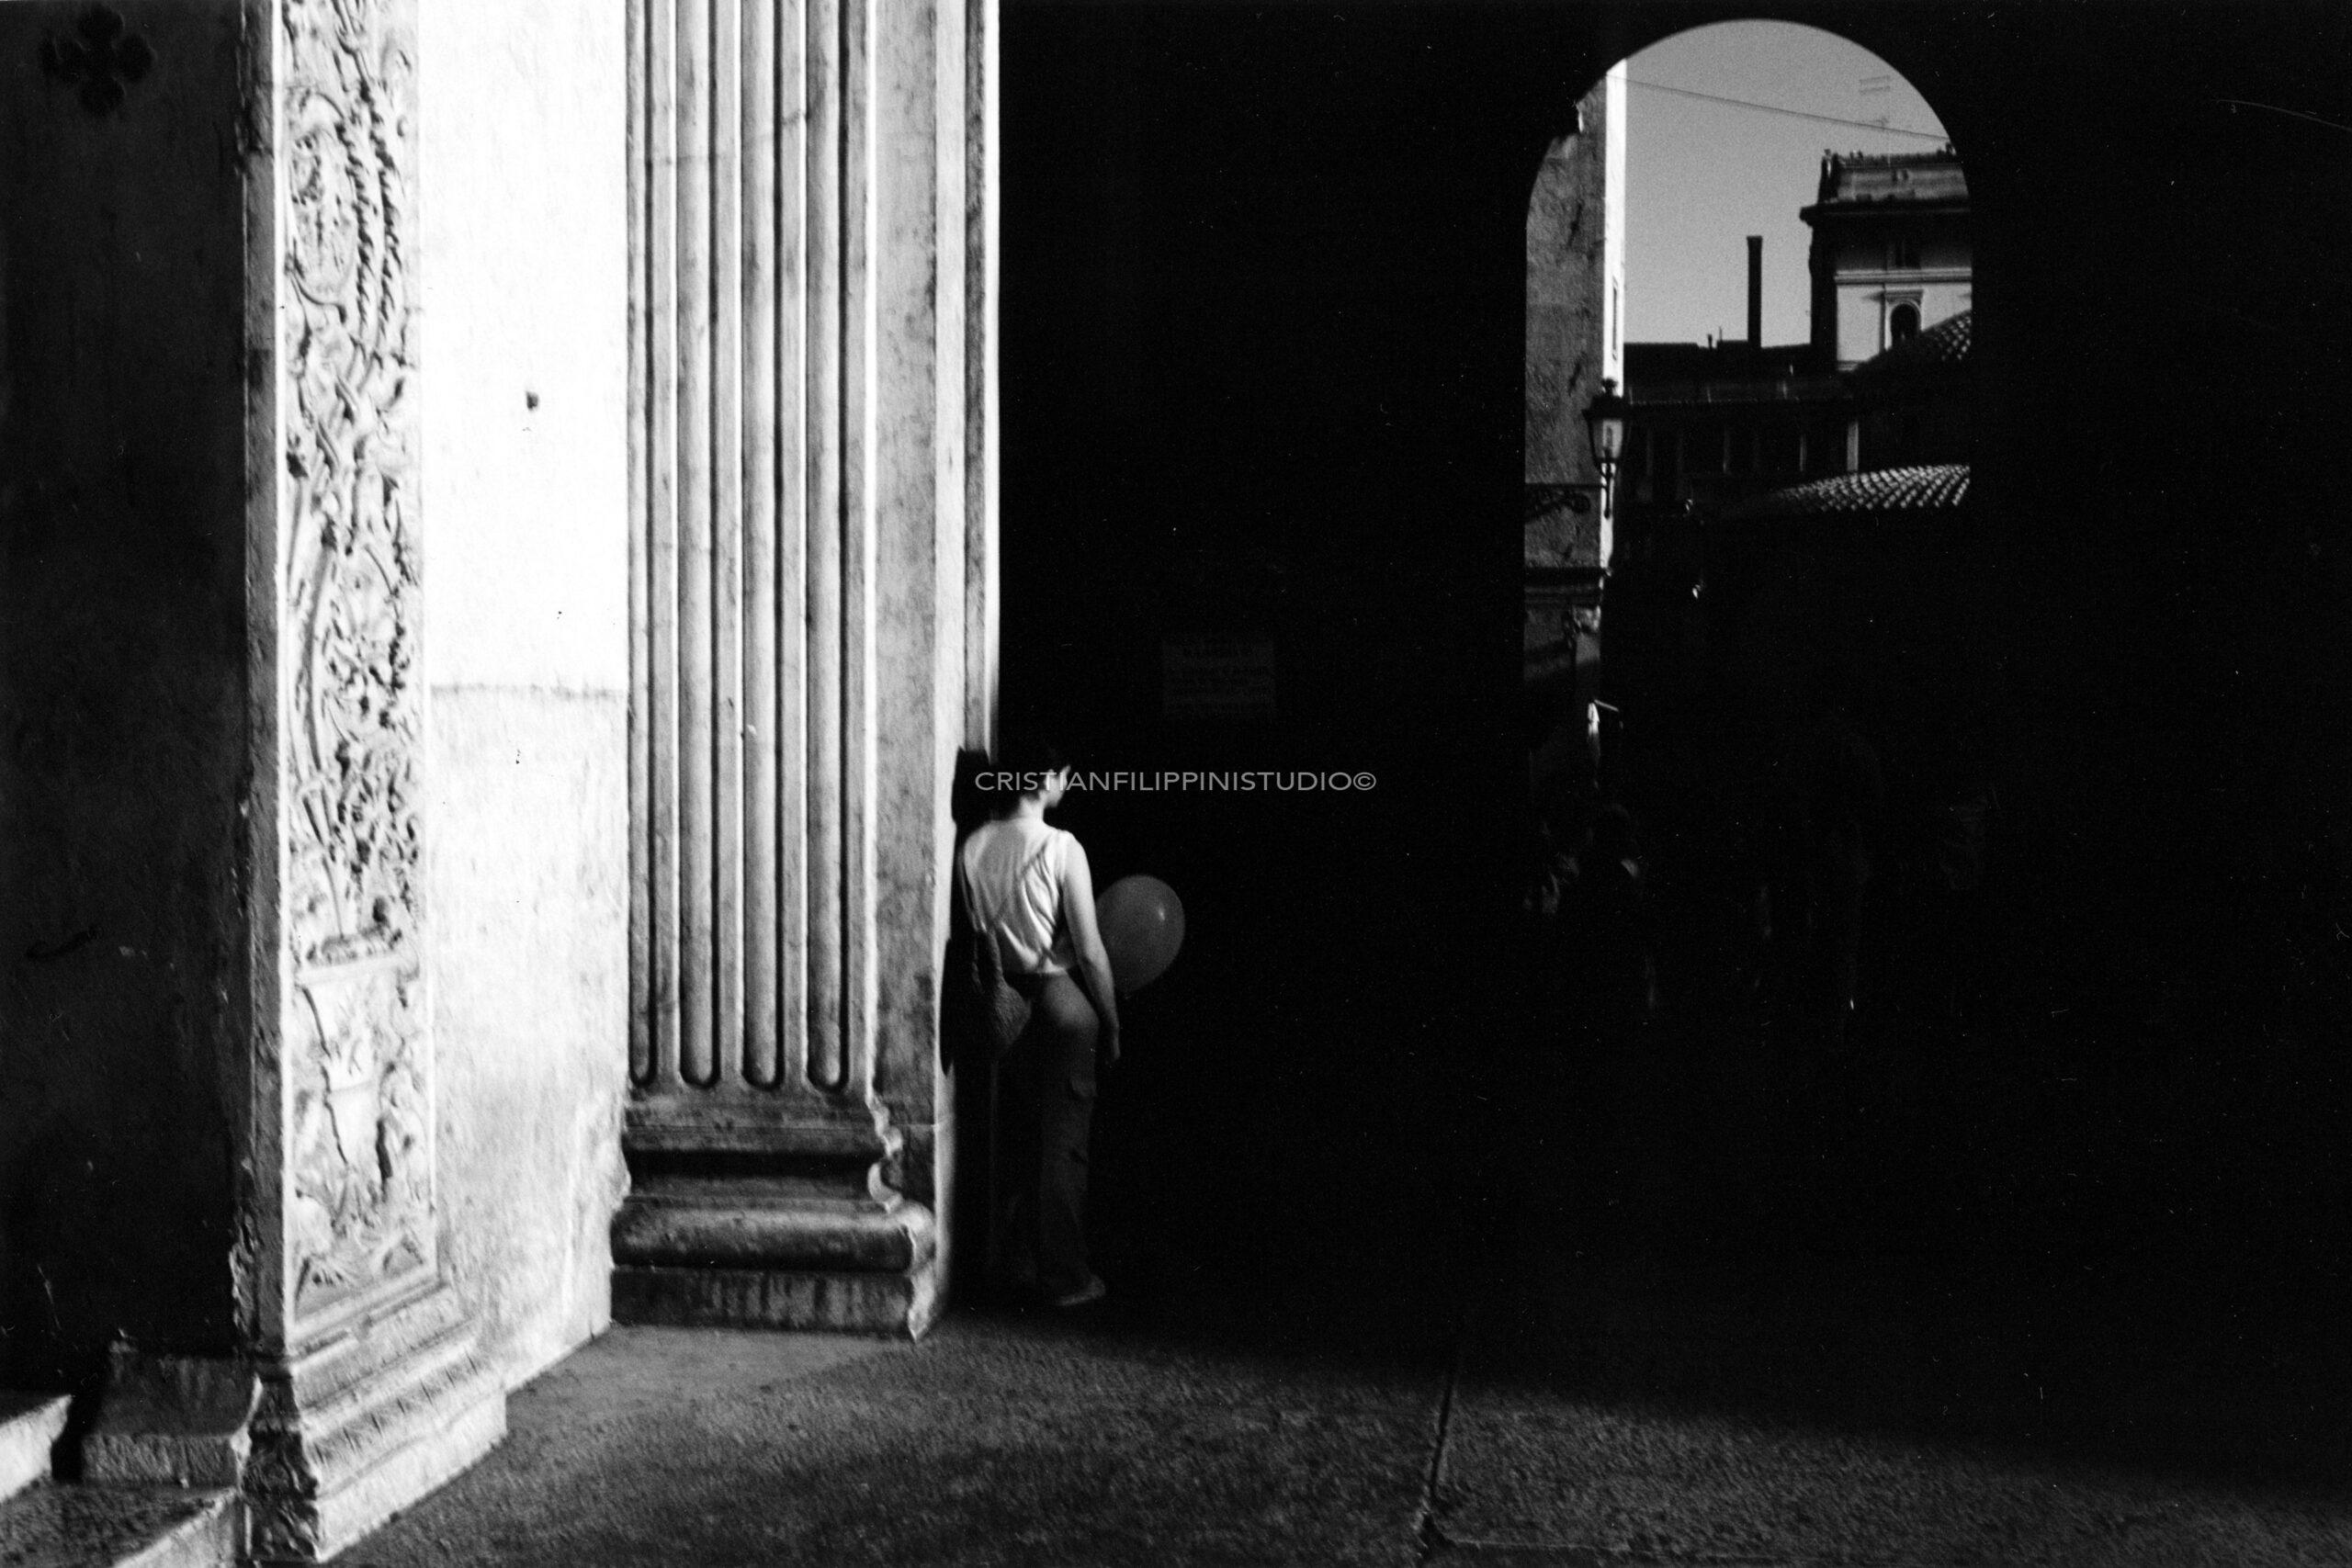 Mantova Italy   Cristian Filippini Studio © Fine Art Photography Video & Advertising